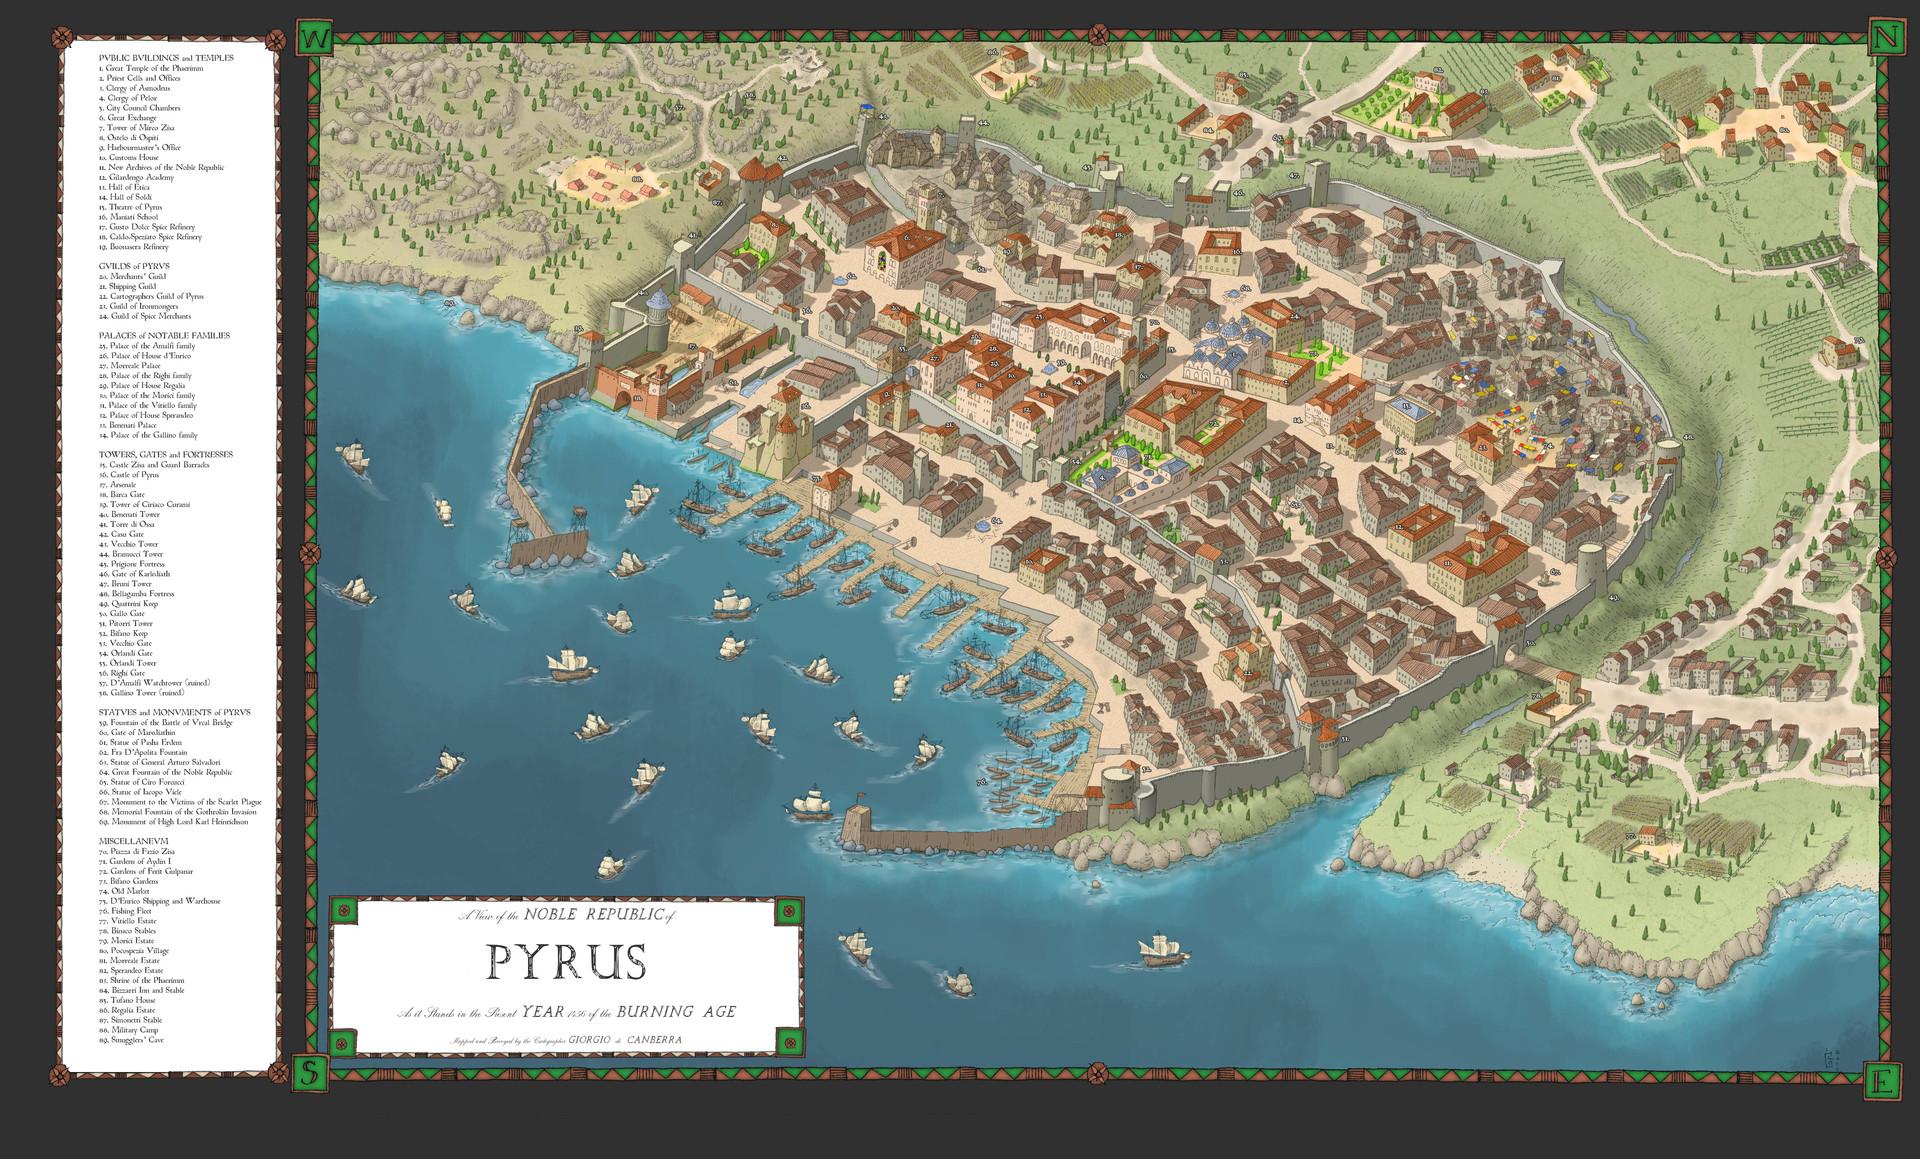 ArtStation - City of Pyrus, George Langridge Gould